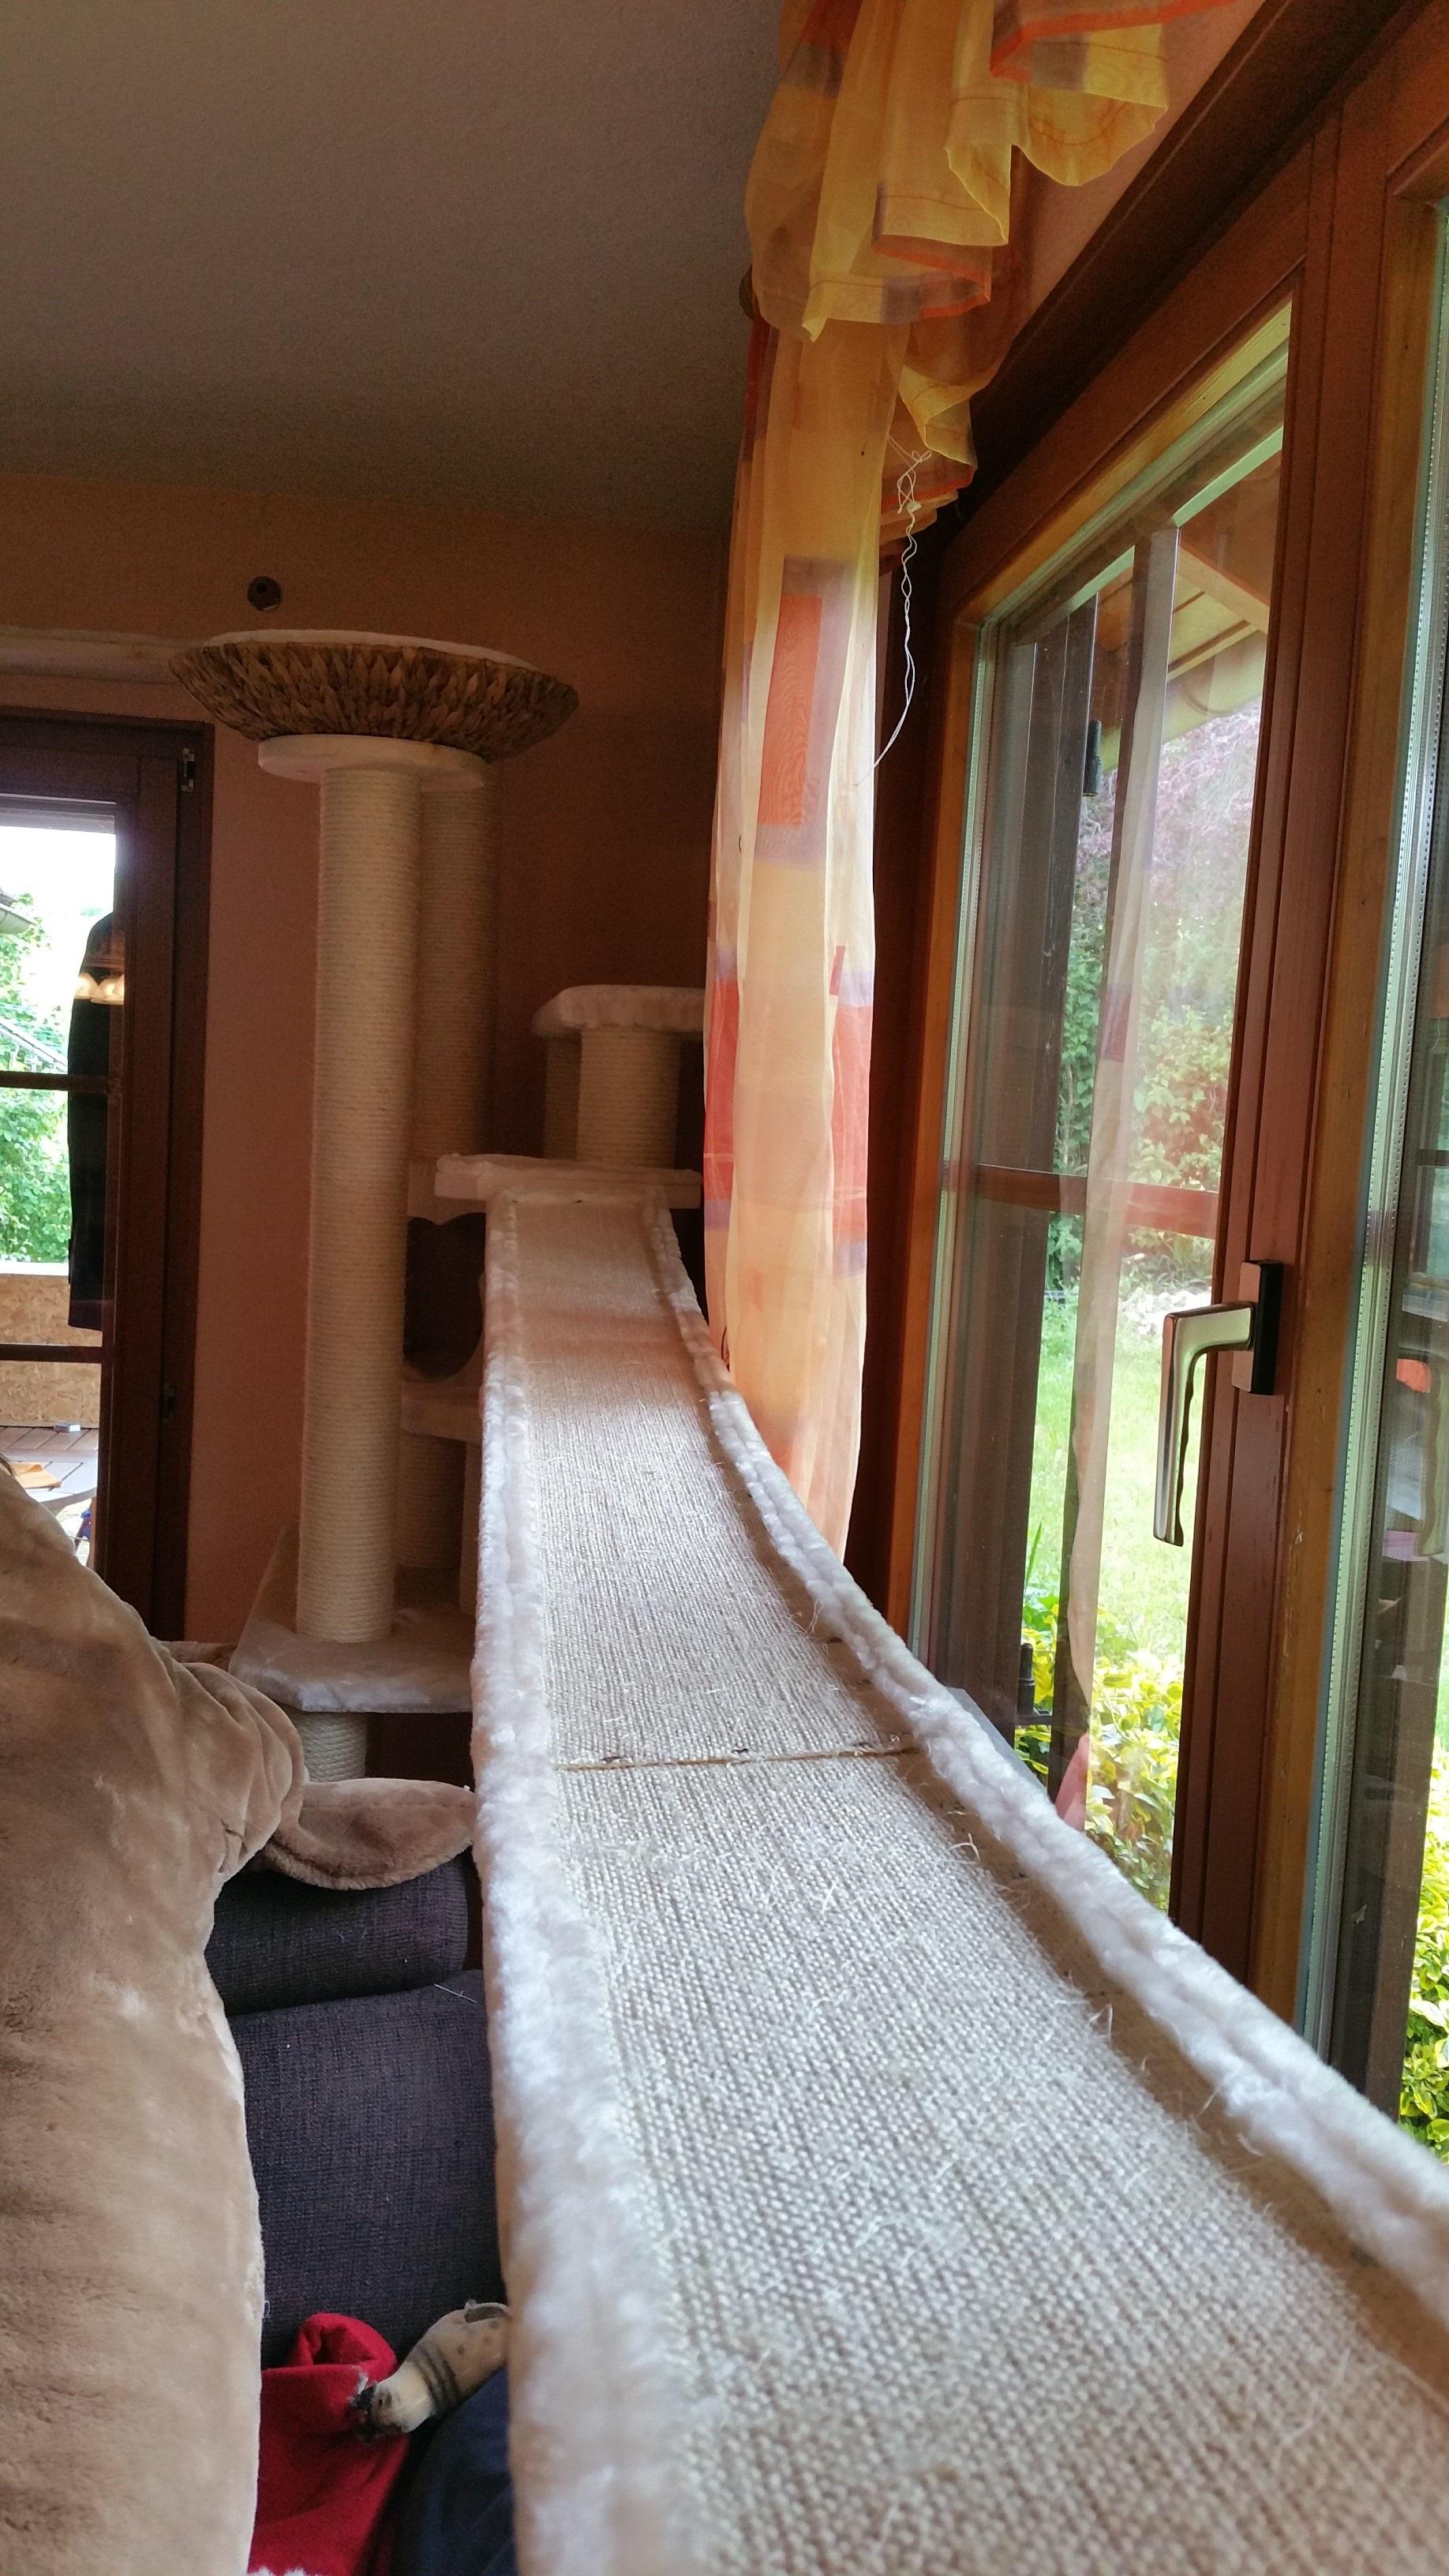 catwalk laufsteg h ngebr cke f r katzen massiv gefertigt. Black Bedroom Furniture Sets. Home Design Ideas